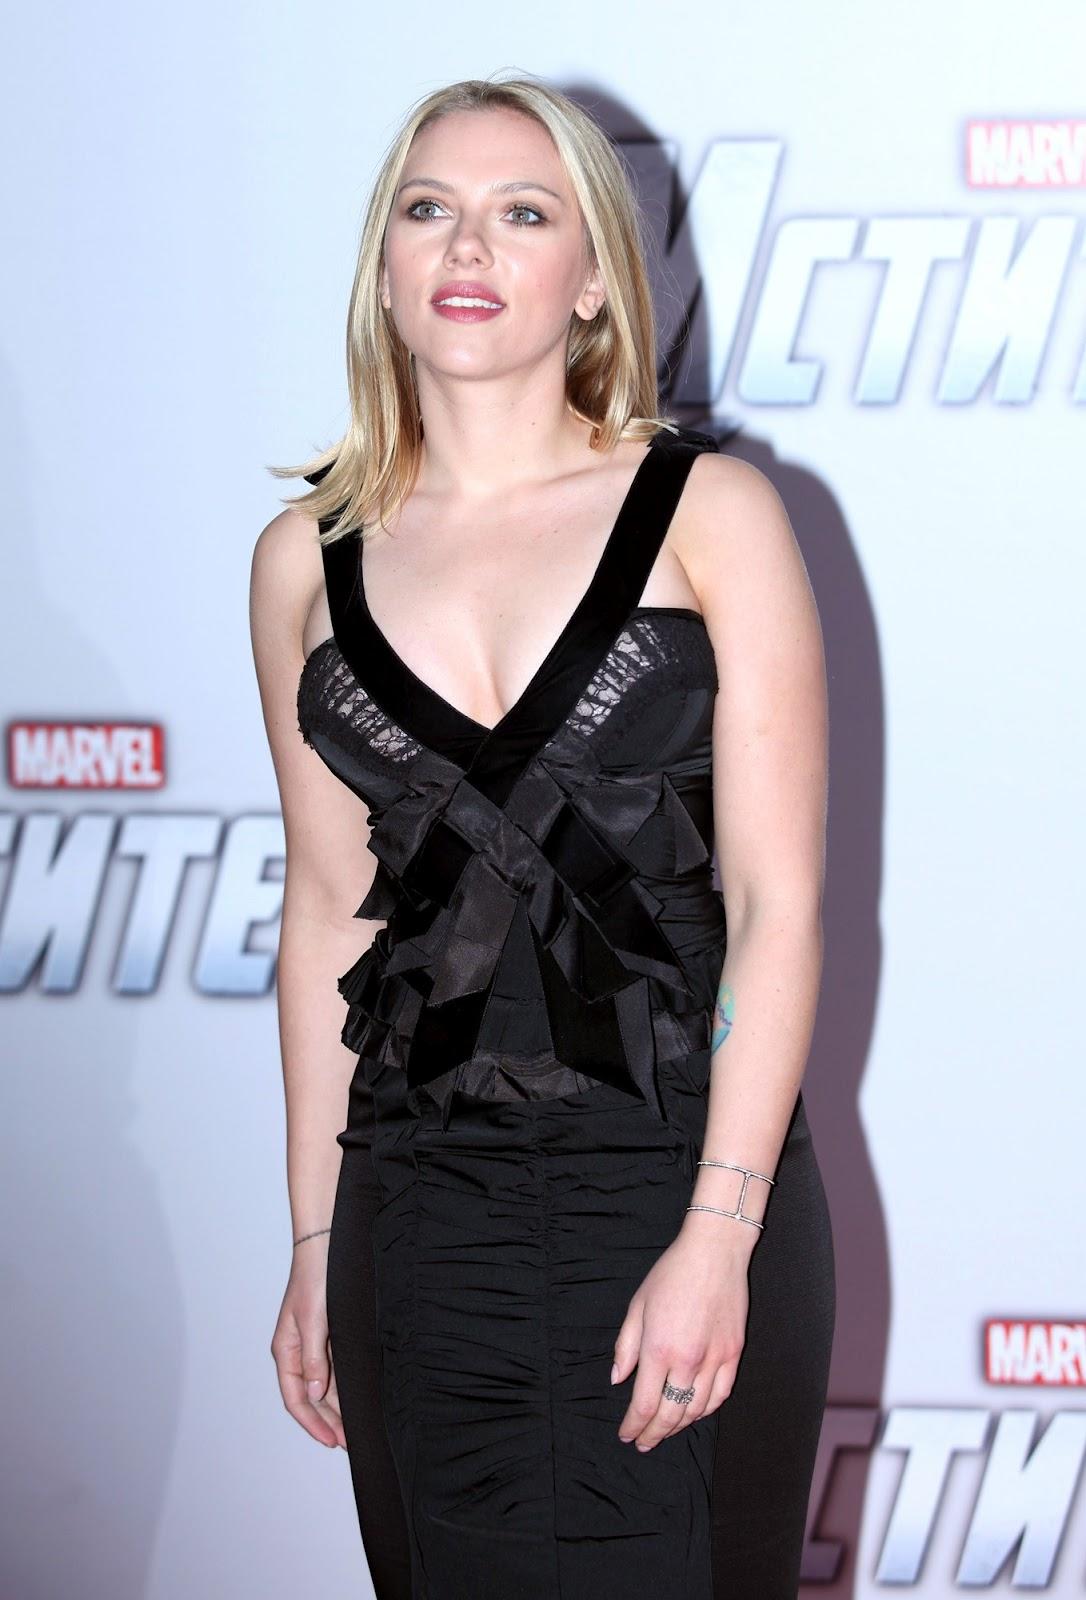 http://2.bp.blogspot.com/-yYka6M8N2iU/T4_dUYqXT-I/AAAAAAAABBE/gN7KykUDgLM/s1600/Scarlett_Johansson_The_Avengers_premiere_Moscow_2012_08.jpg